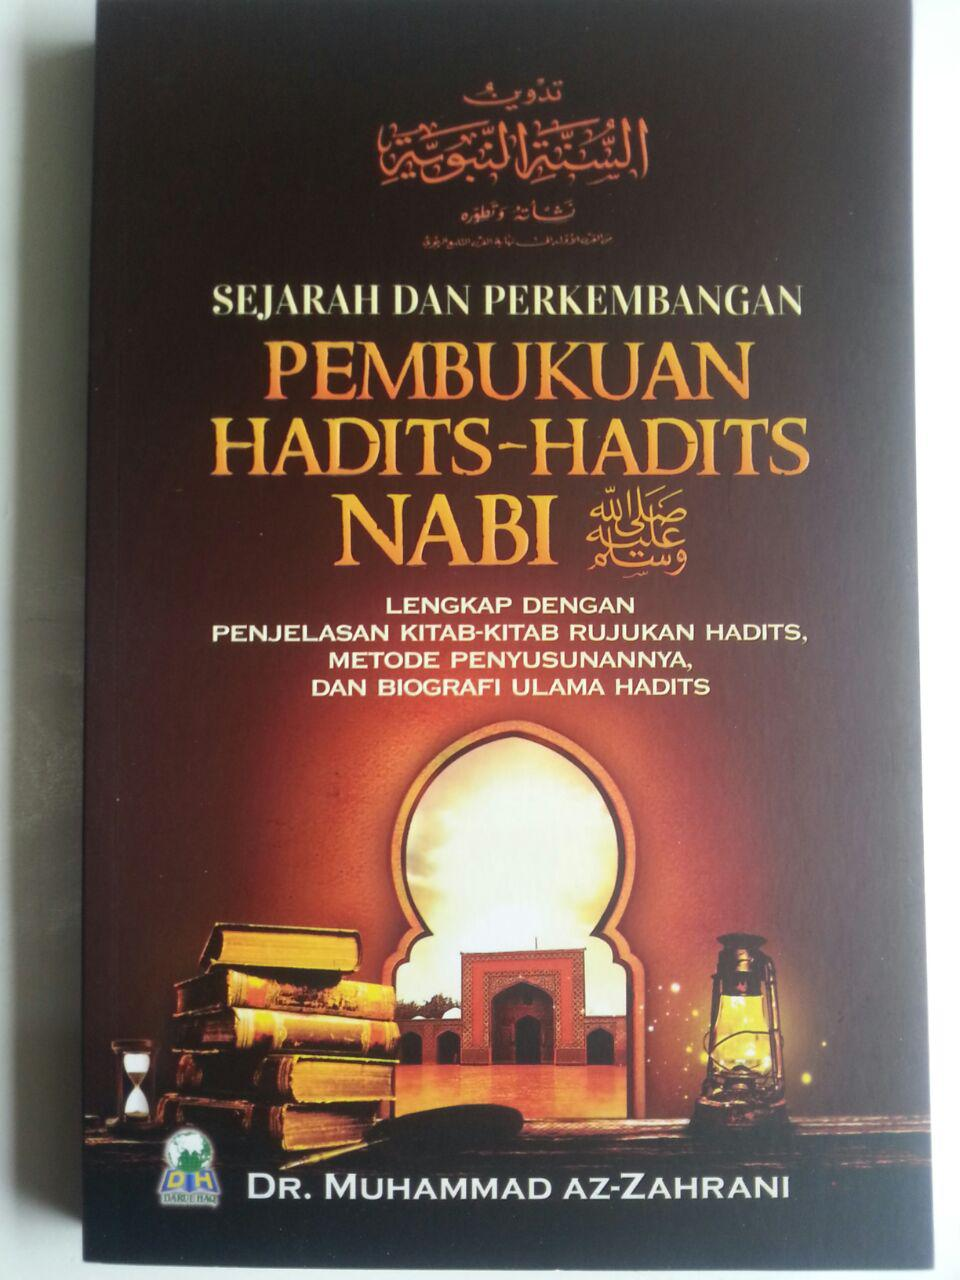 Buku Sejarah Dan Perkembangan Pembukuan Hadits-Hadits Nabi cover 2